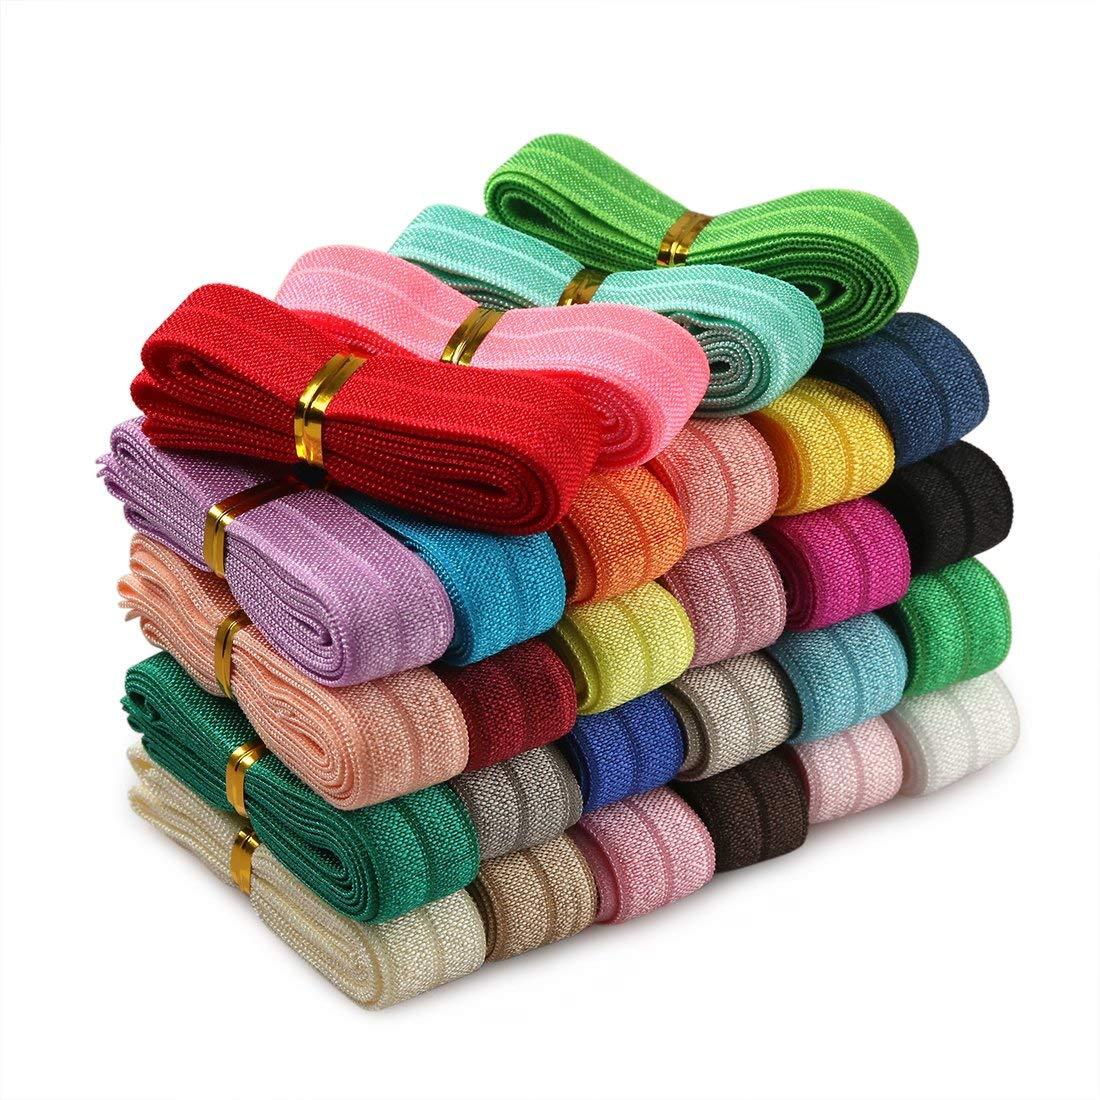 Grab Bag Printed Fold Over Elastic Stretch Foldover FOE Elastics for Hair Ties Headbands Multi,10 Yards 5//8 Fold Over Elastic-10 Yards- FOE